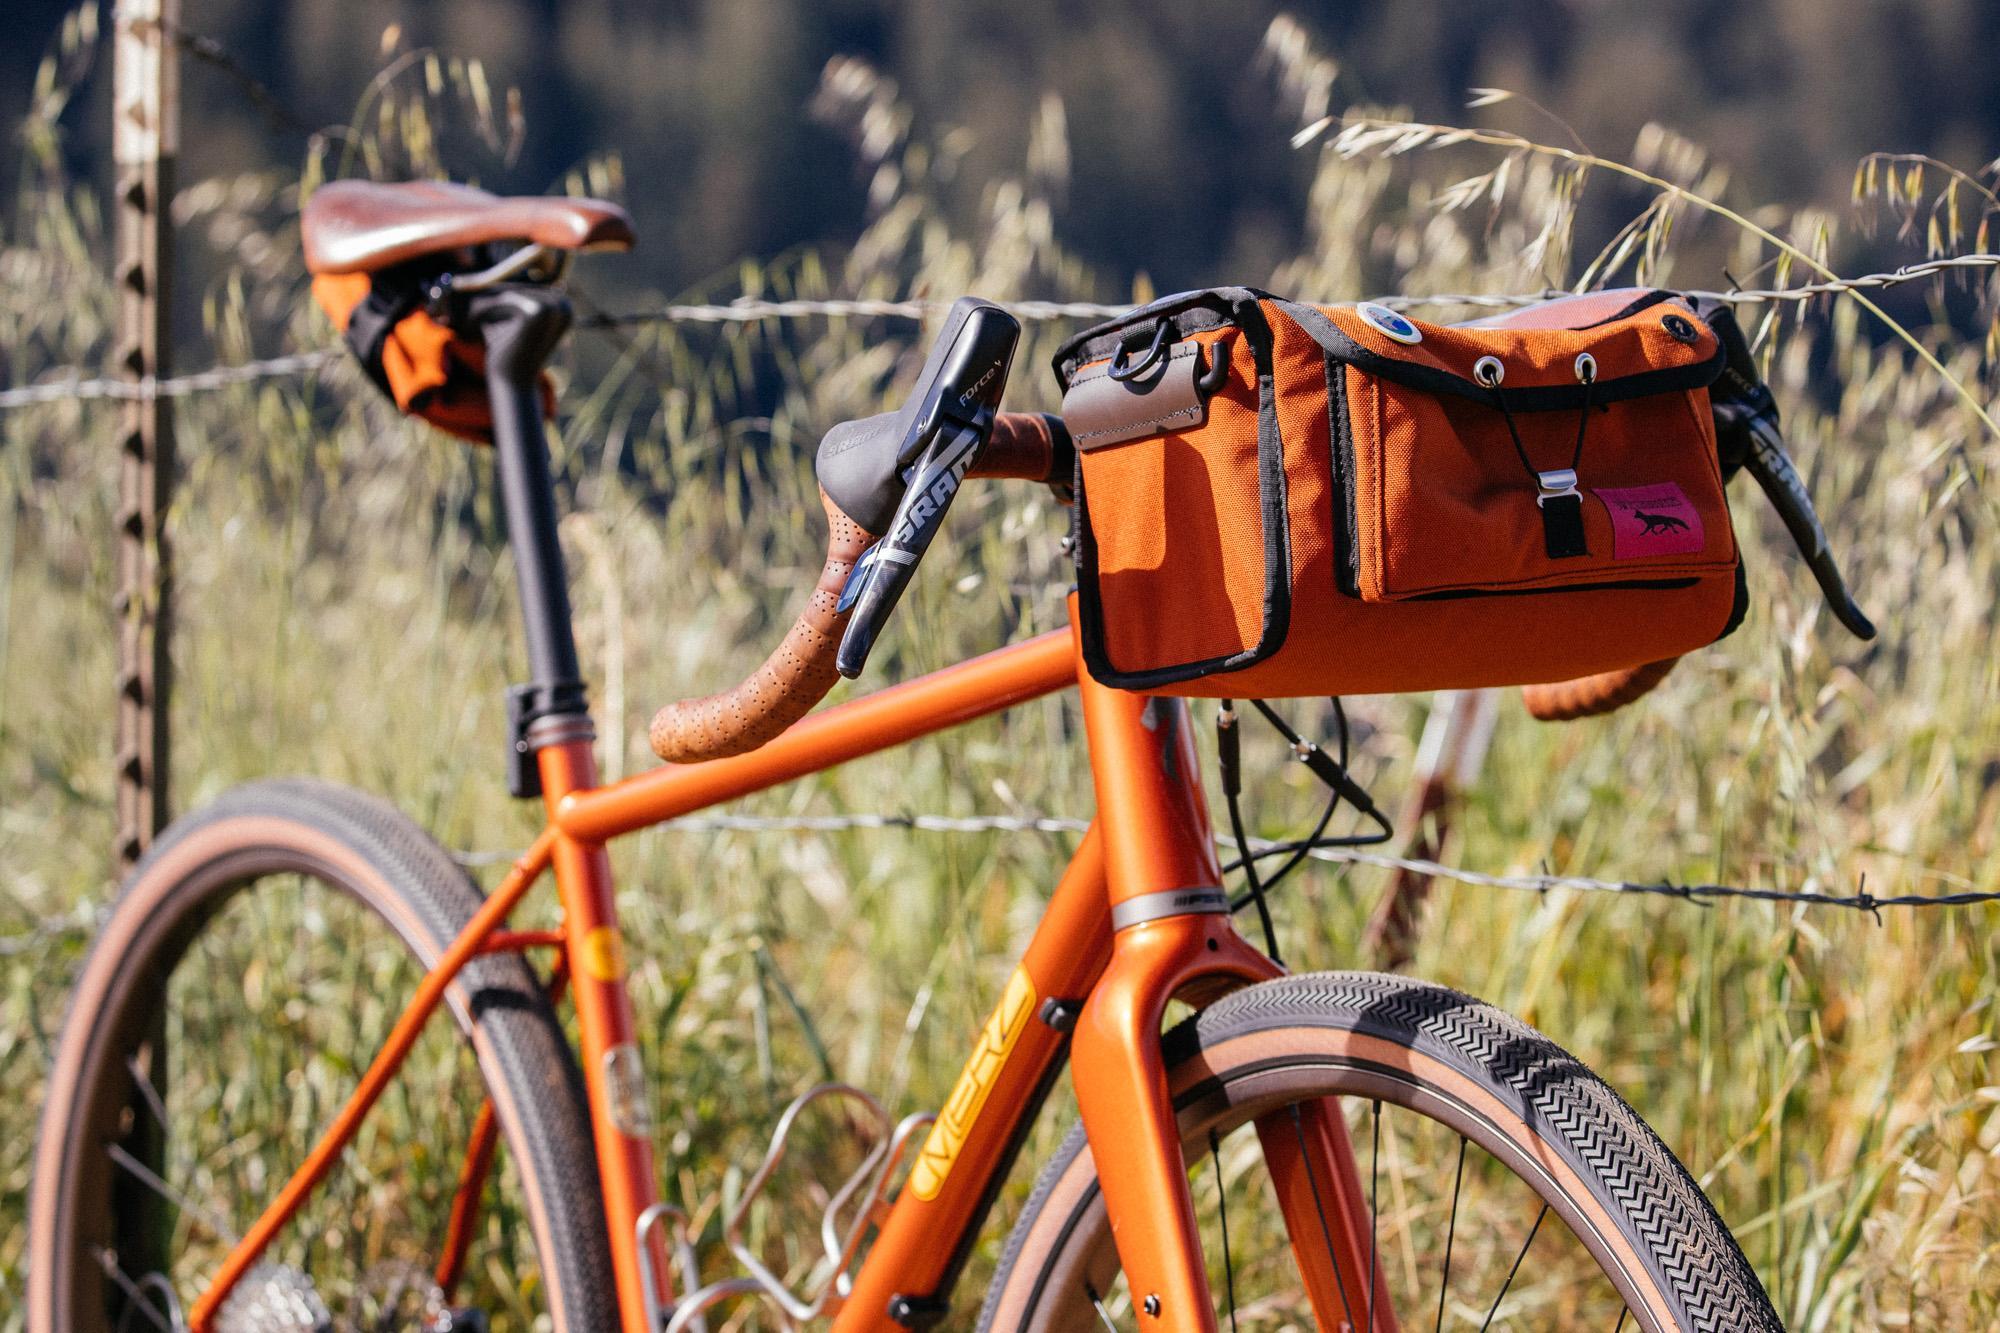 Erik Nohlin's Merz Edition Sequoia fresh off a 400km Brevet